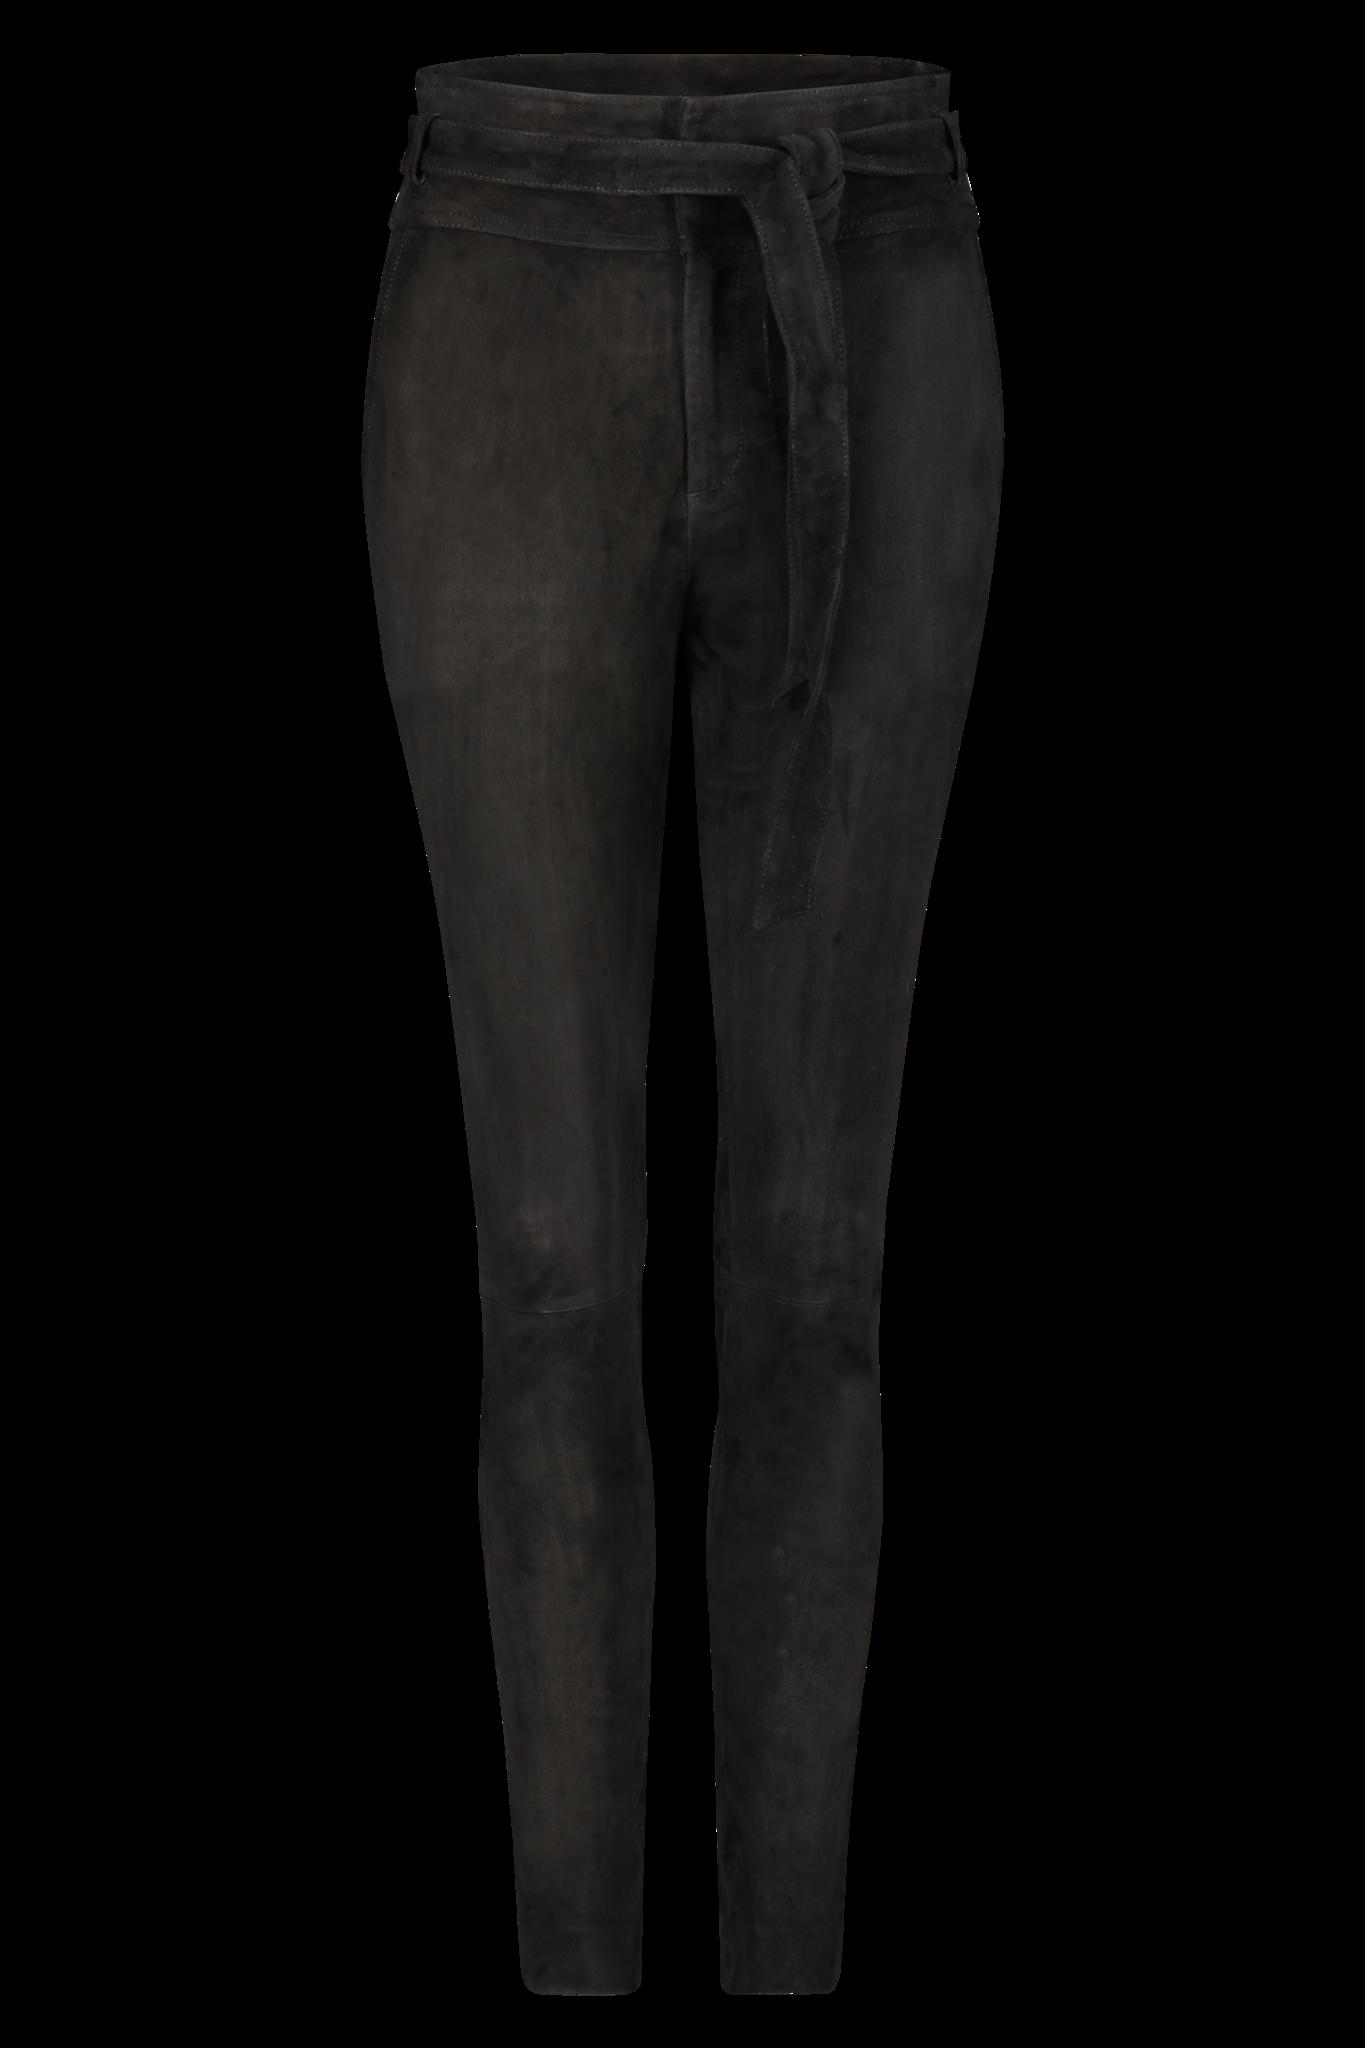 Ann Suede Pant - Black S-1